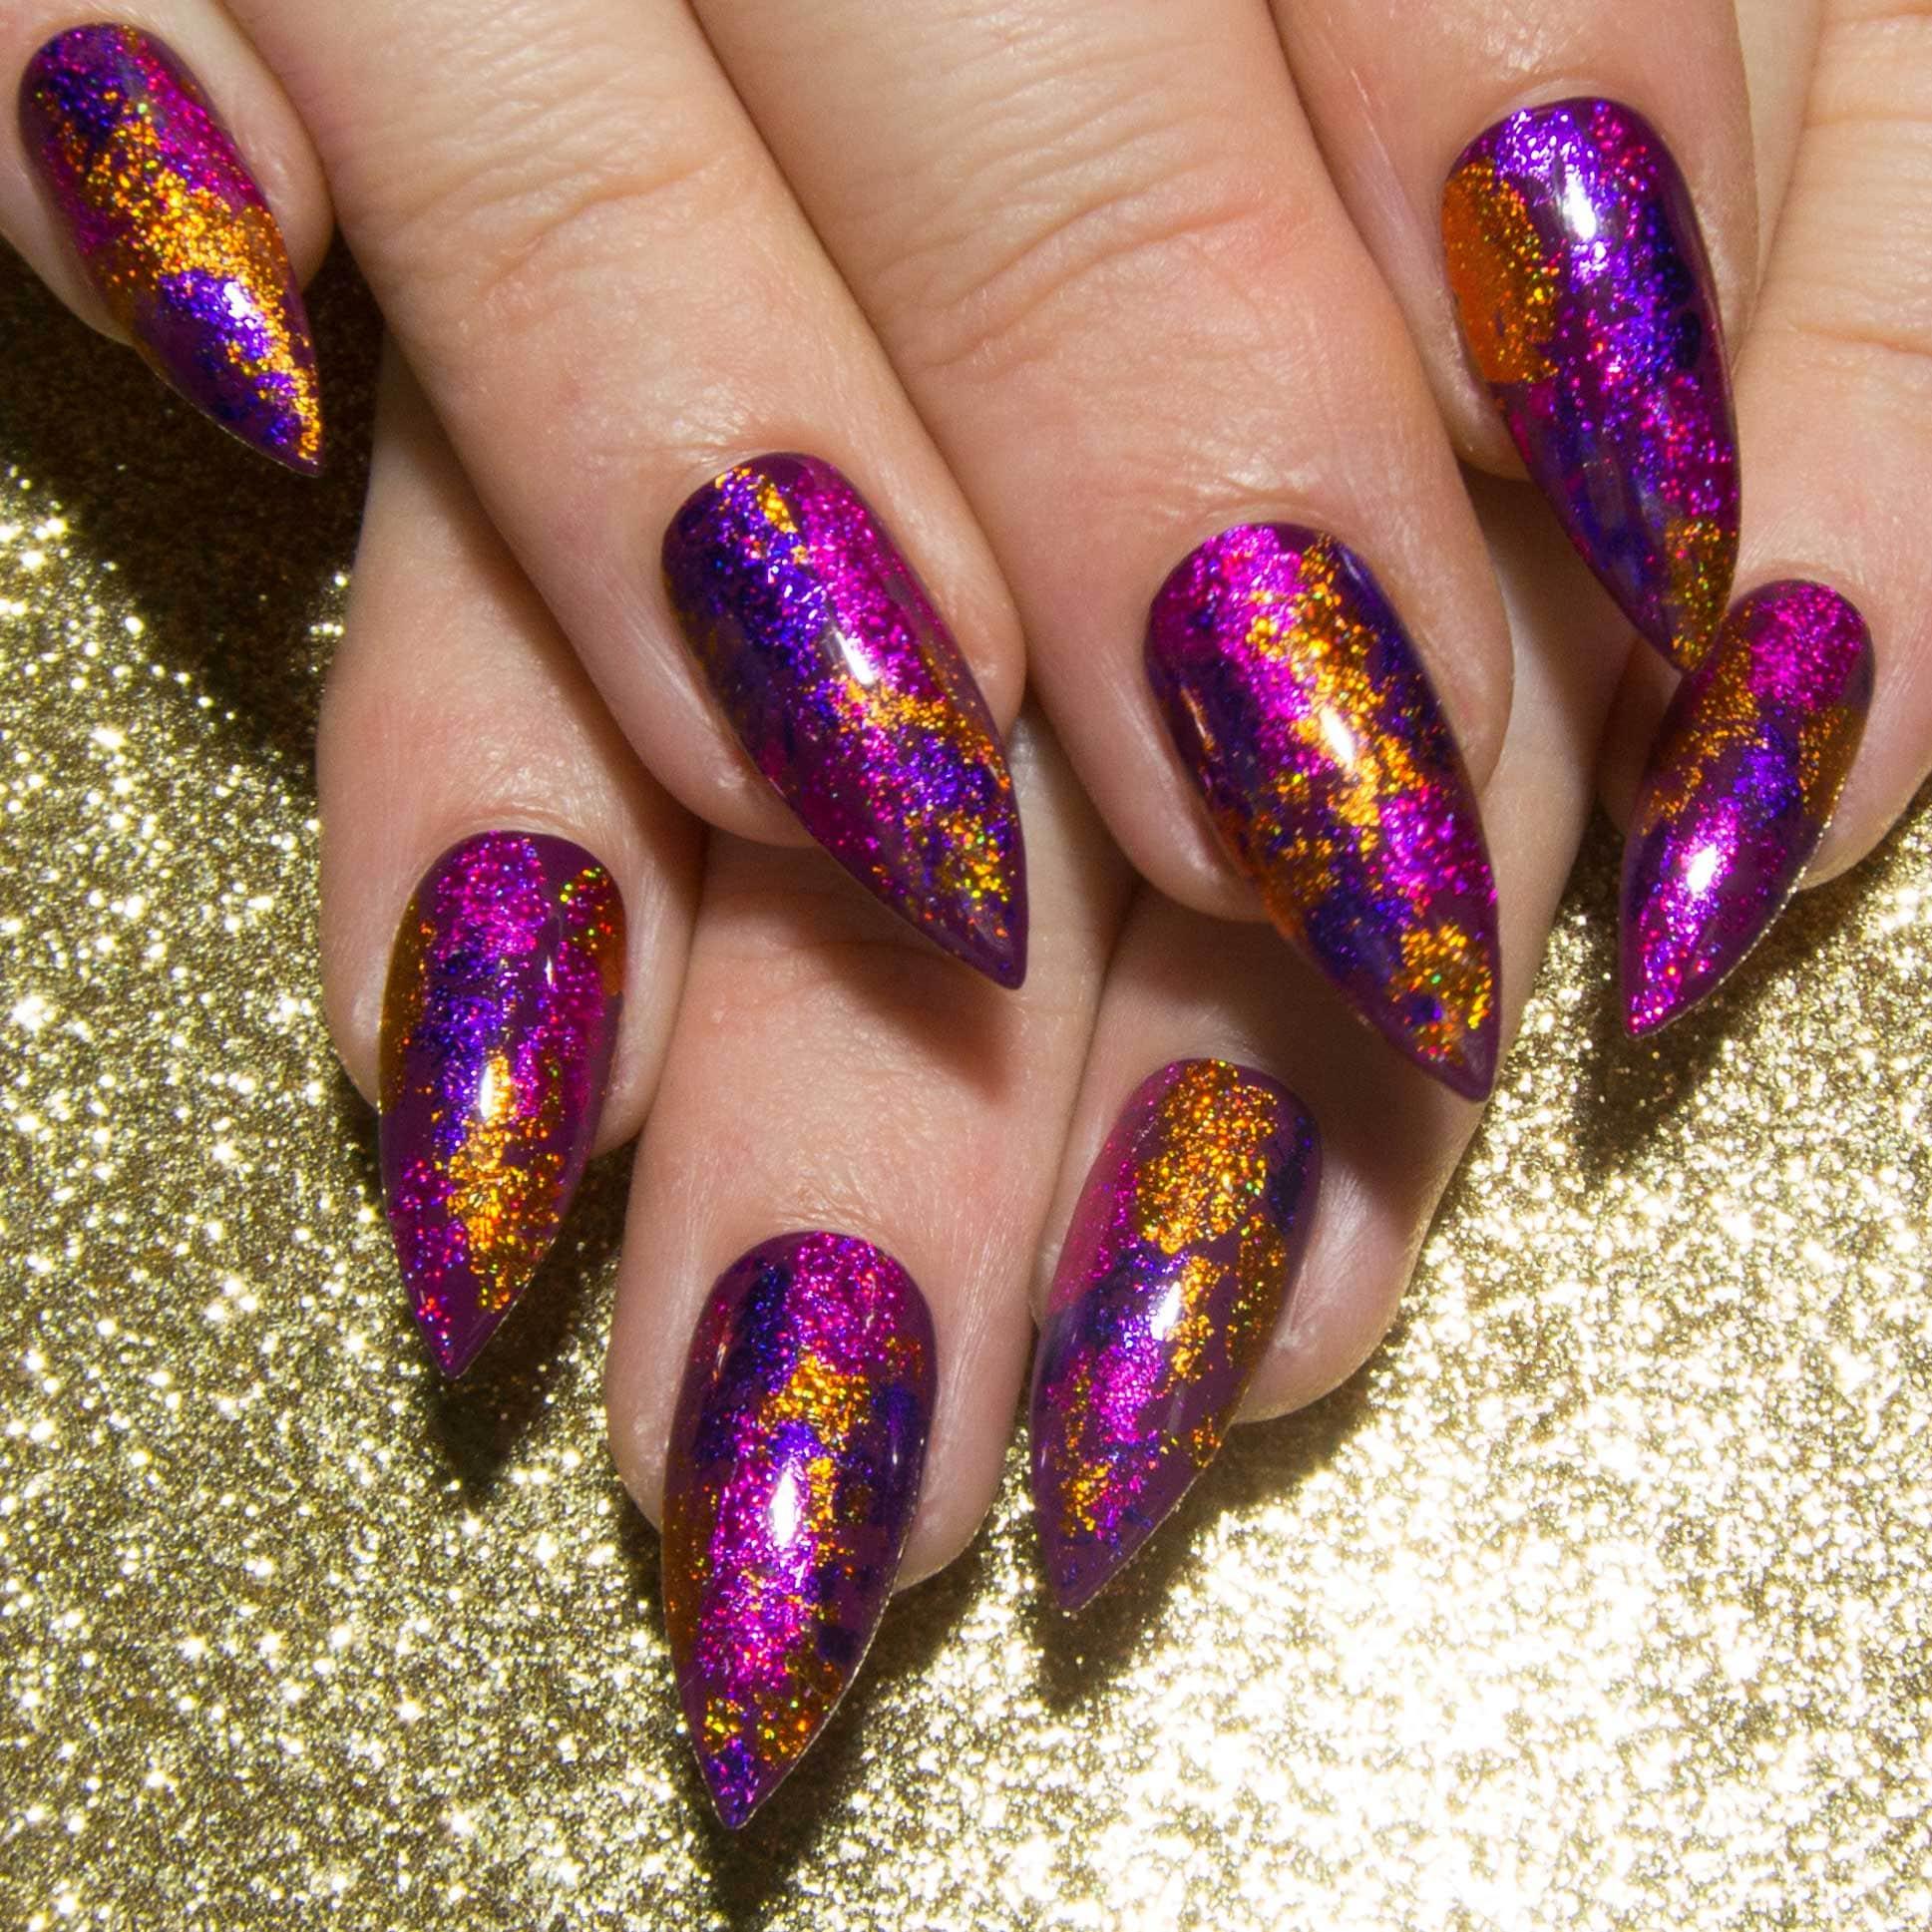 Stiletto-Acryl-Nägel Glitter falsche Nägel Pink Spitzen